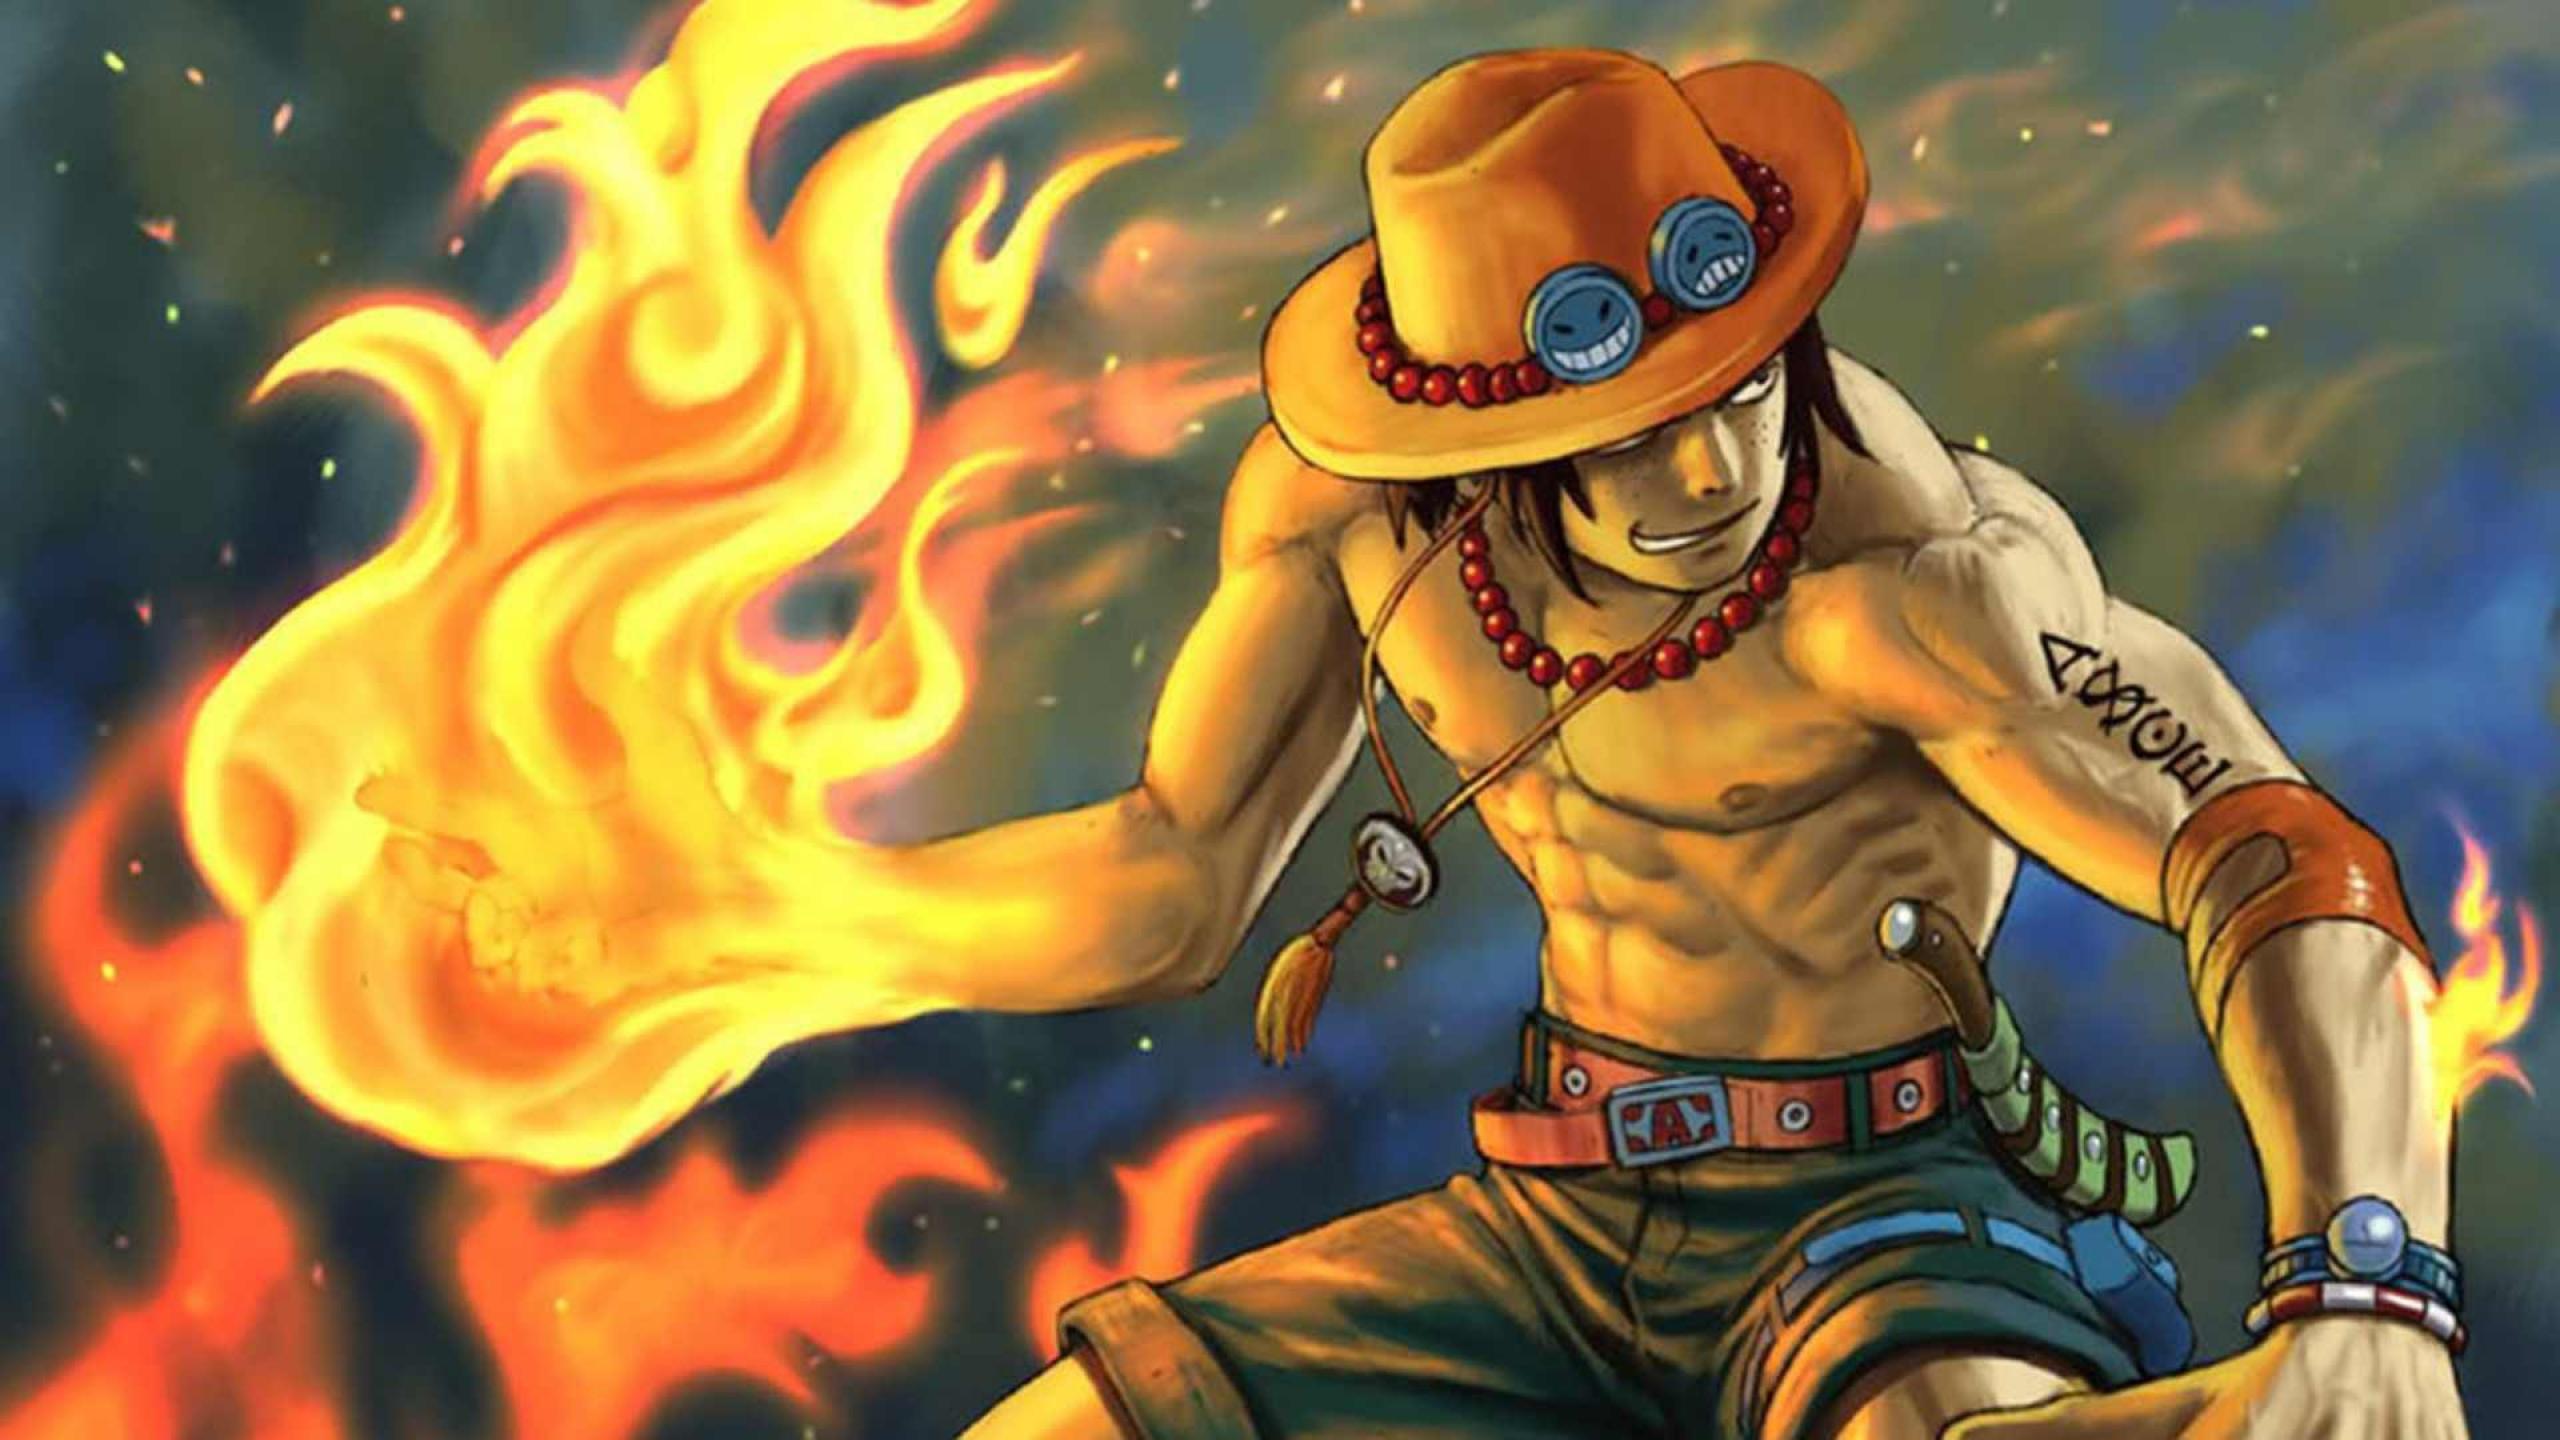 One Piece Wallpaper Hd Anime Images Free Download Desktop